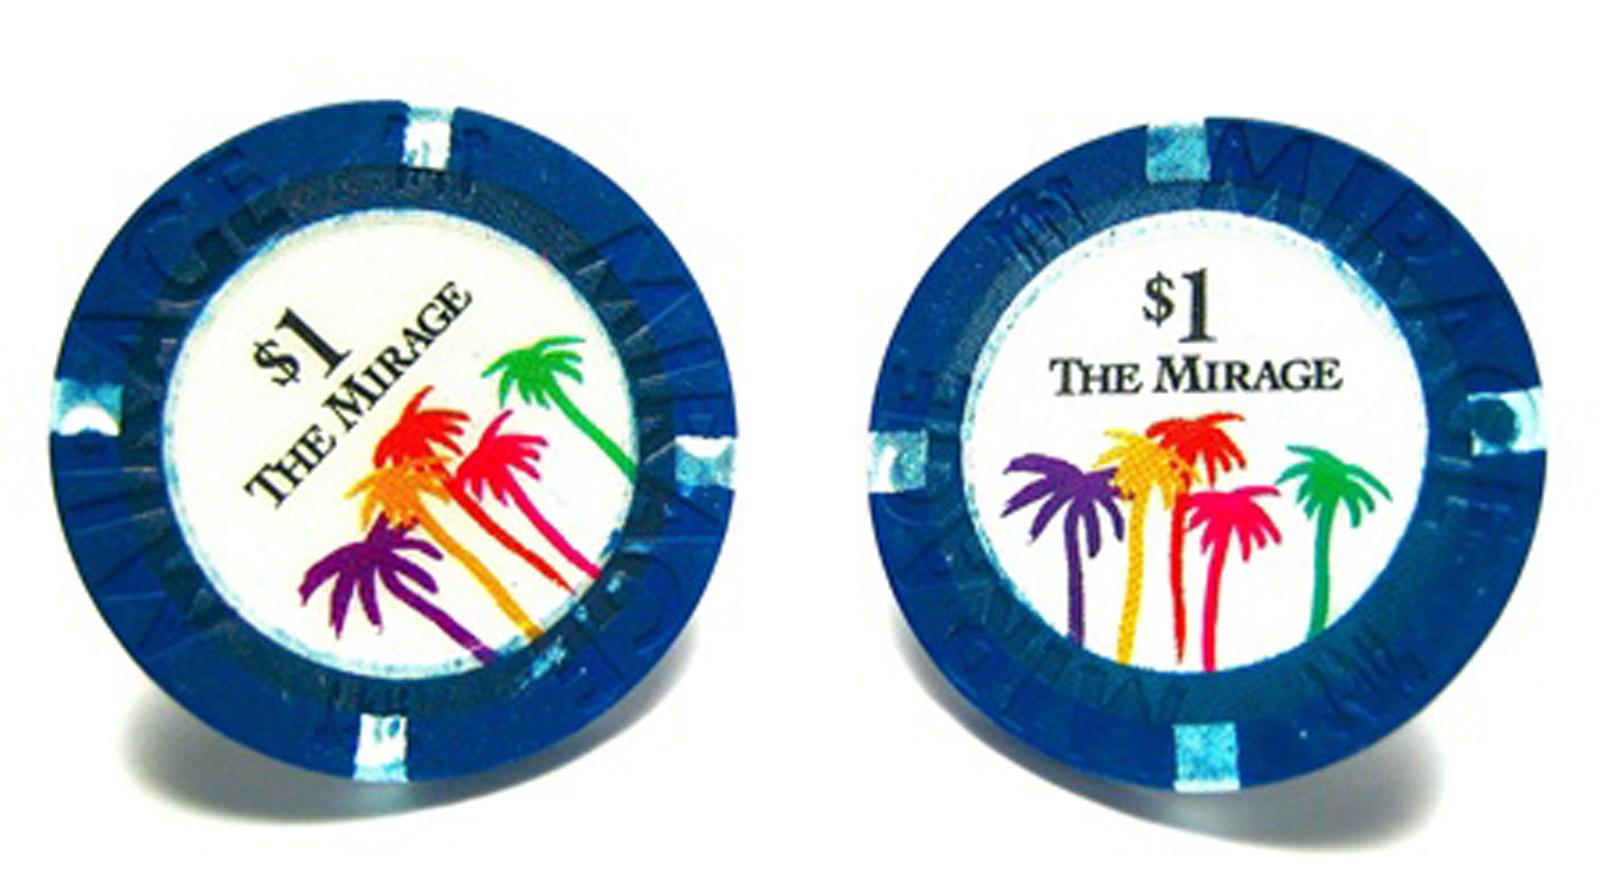 real casino poker chips